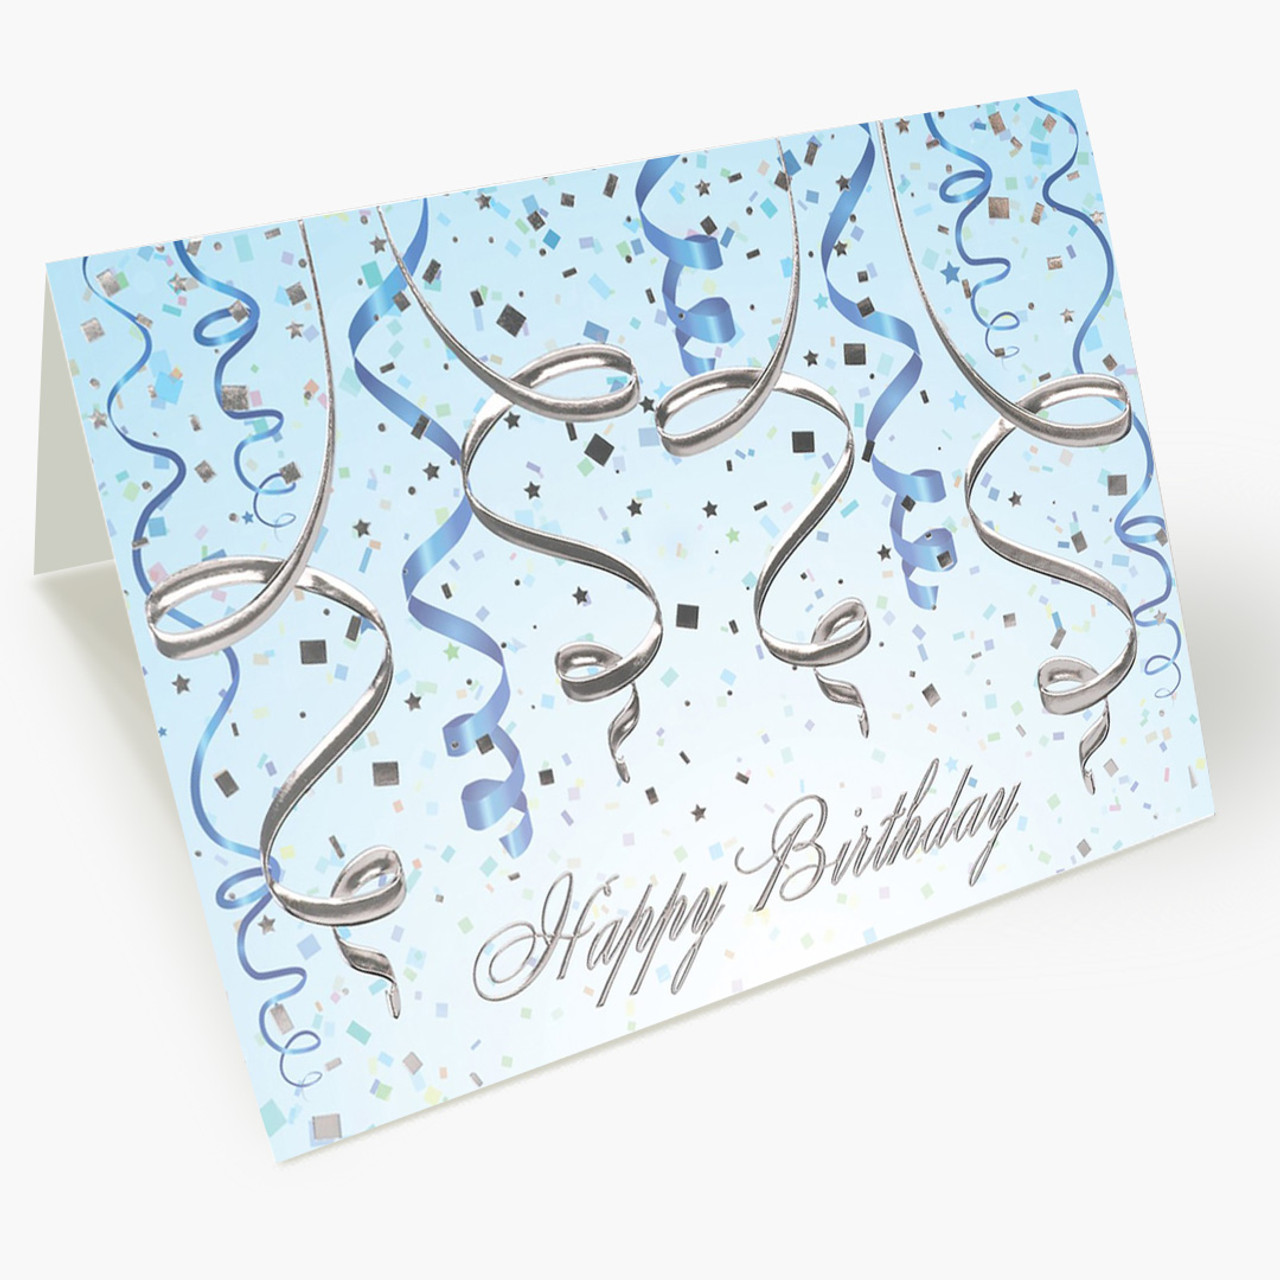 Celebration Is On Birthday Card